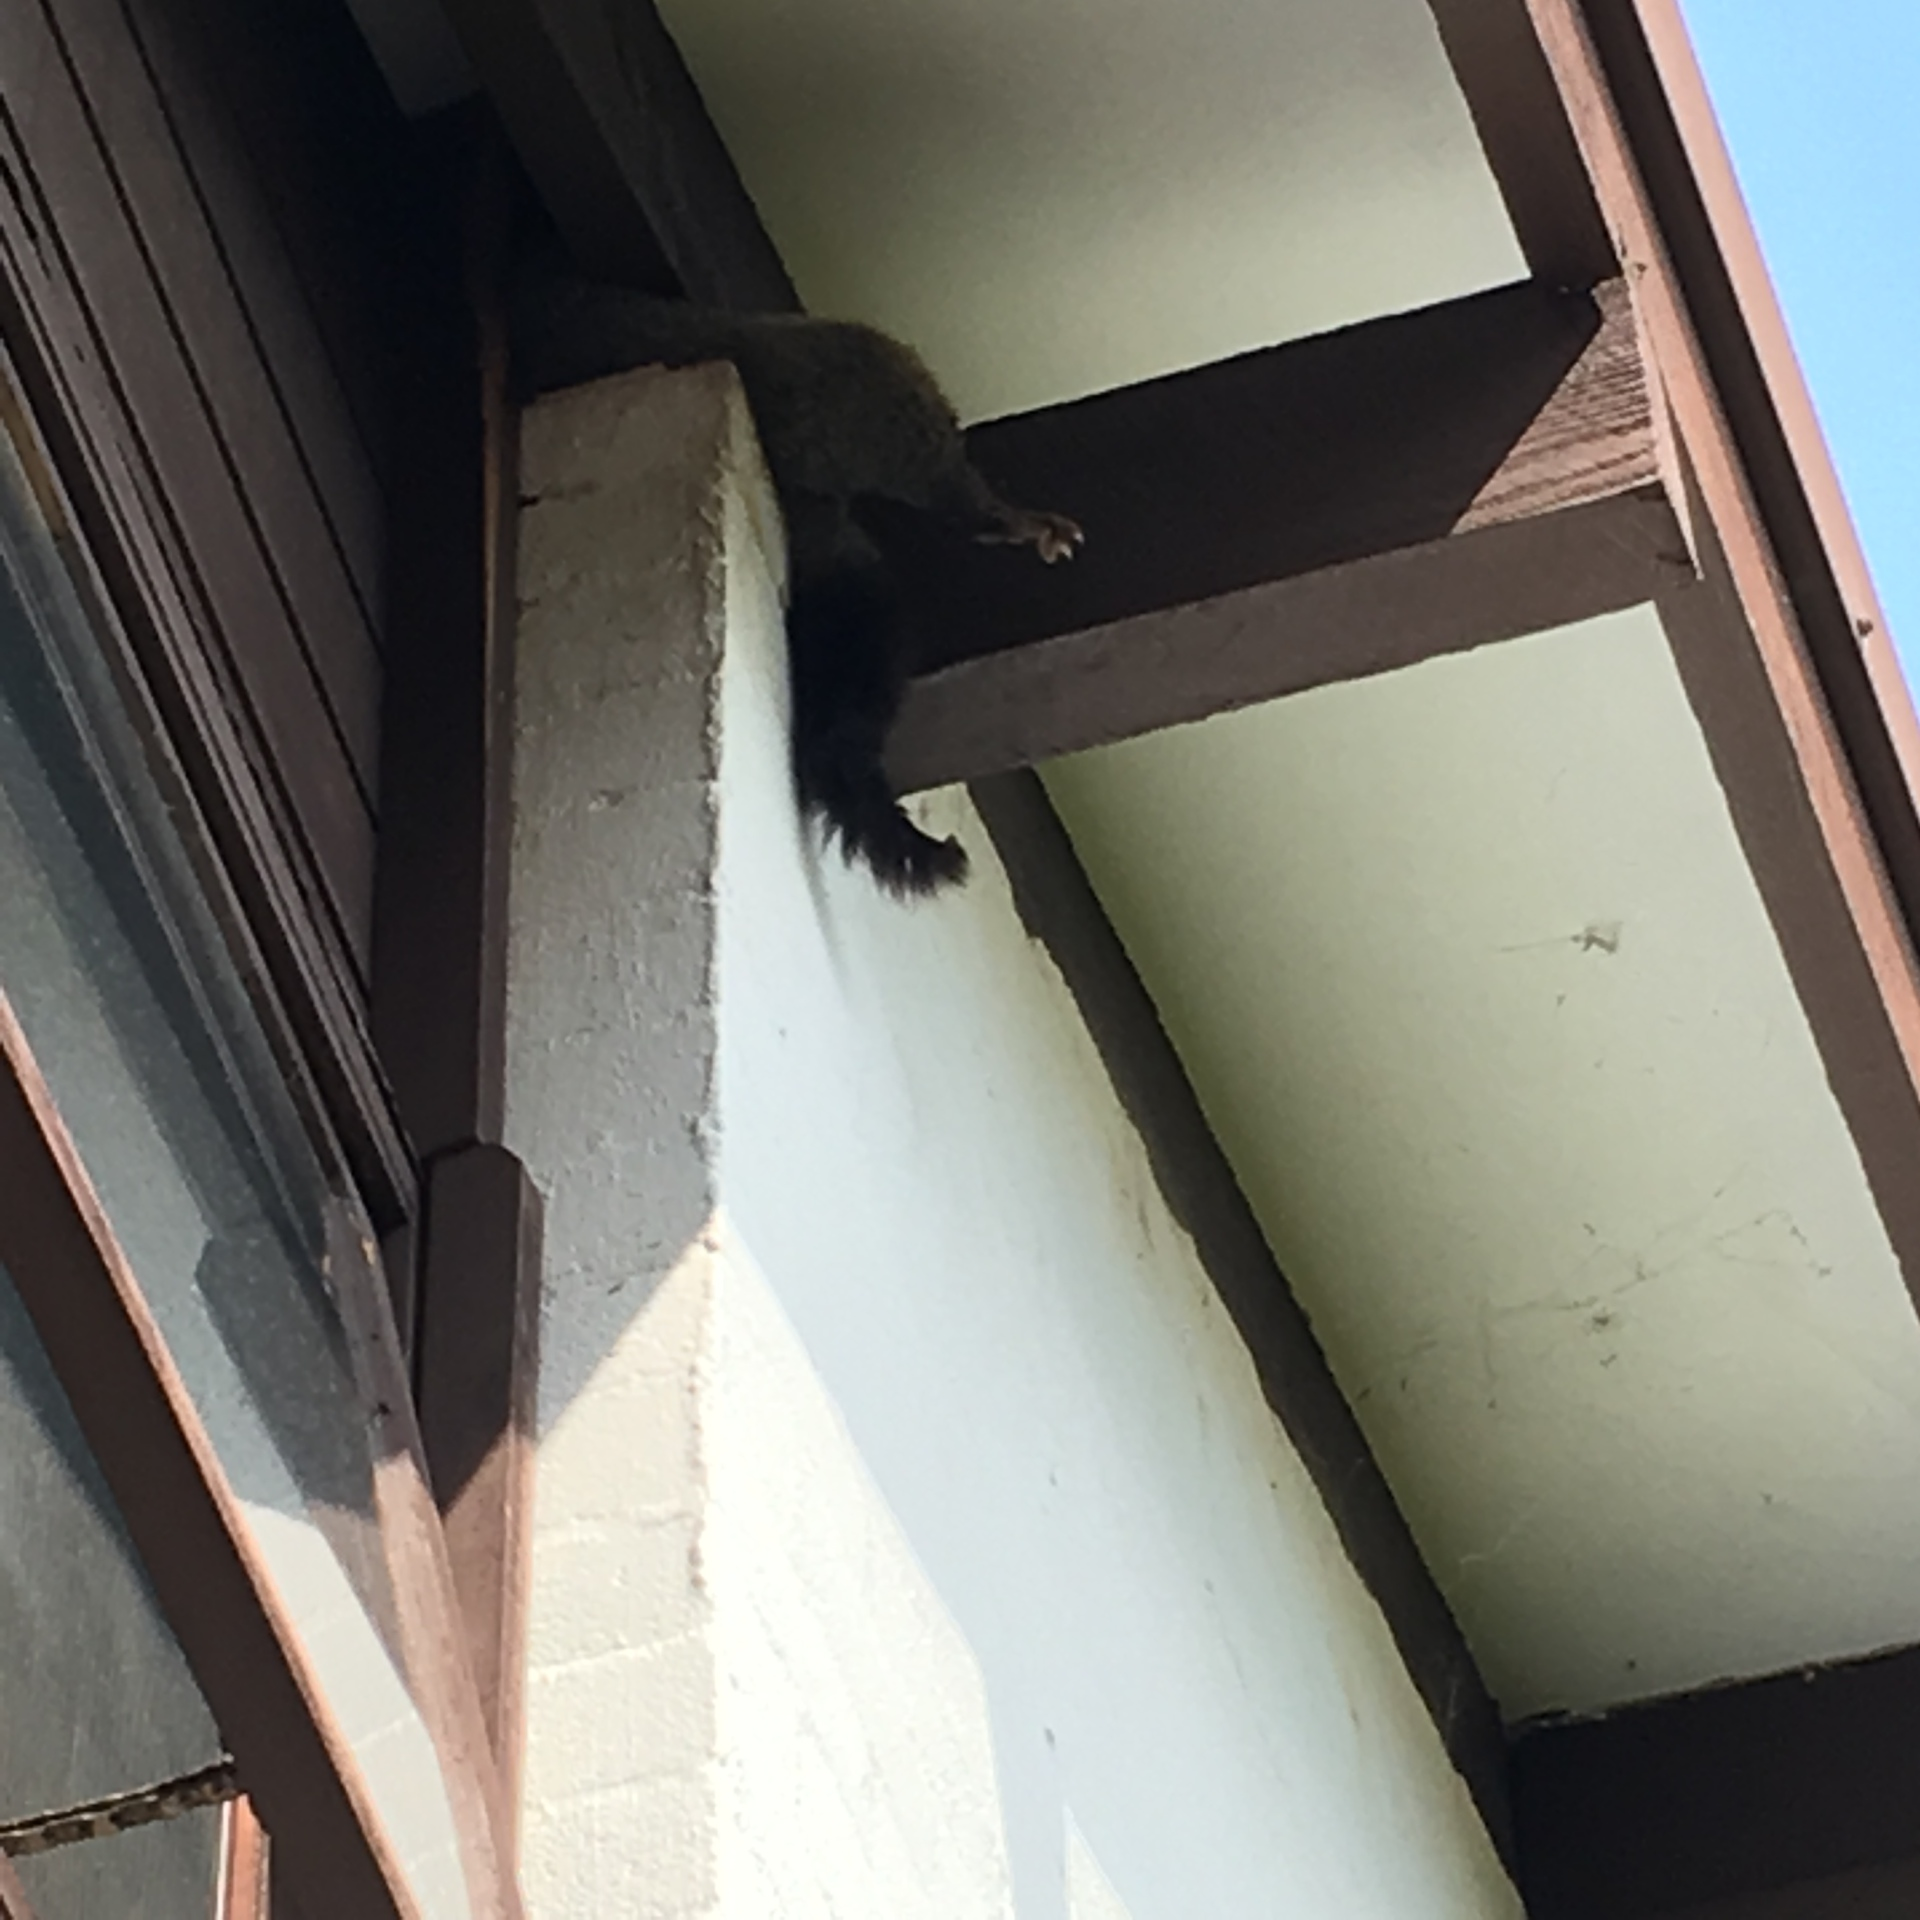 Possum Entering Wall Cavity.